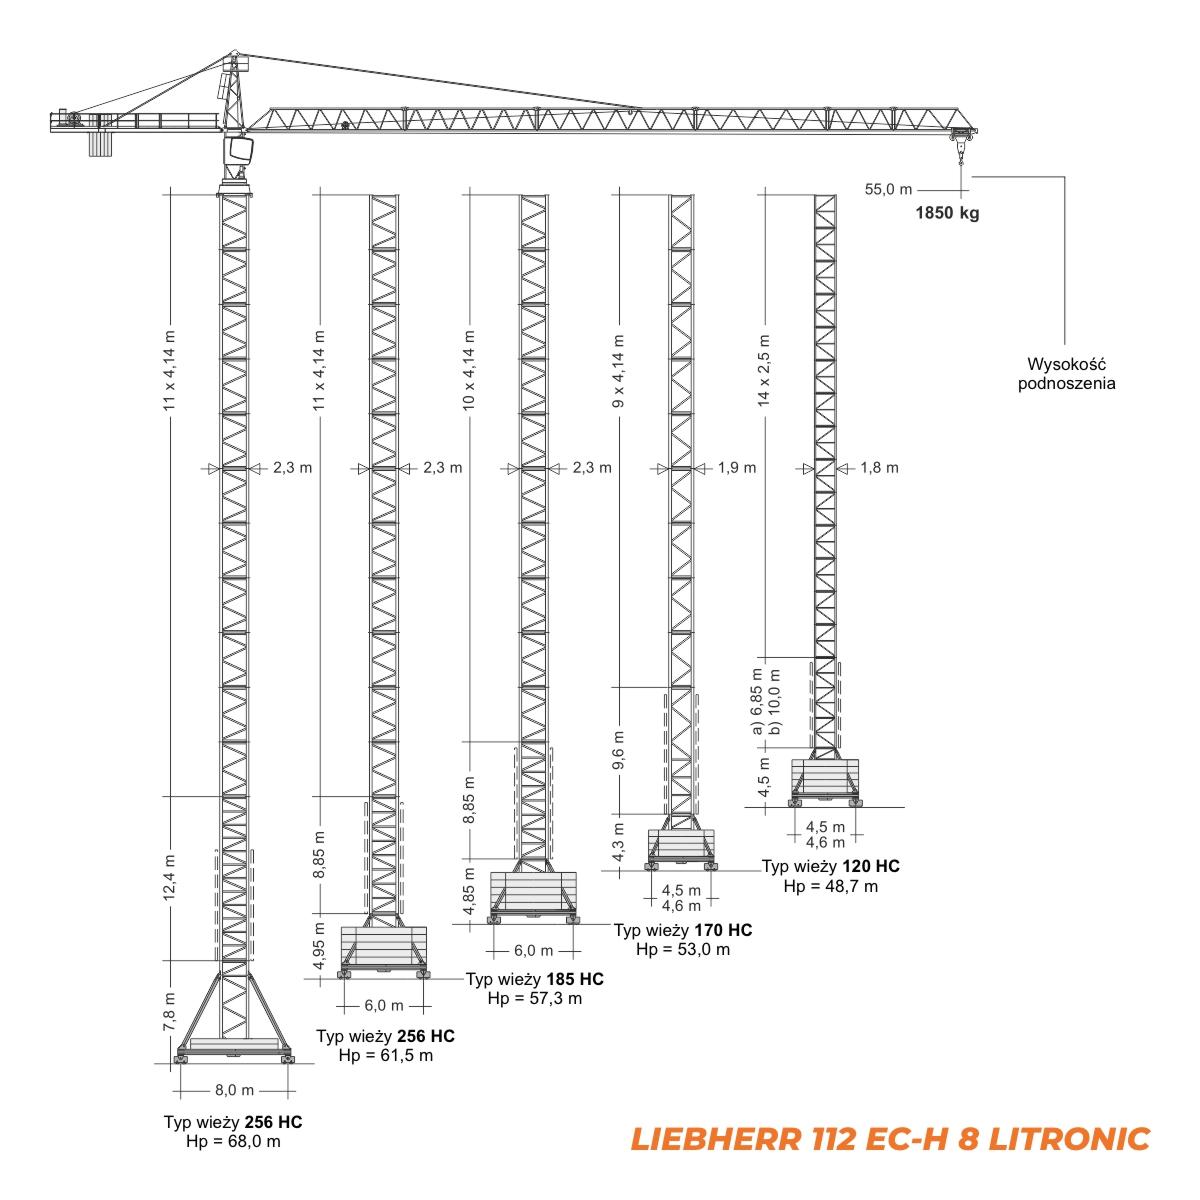 Liebherr 112 EC-H 8 LITRONIC